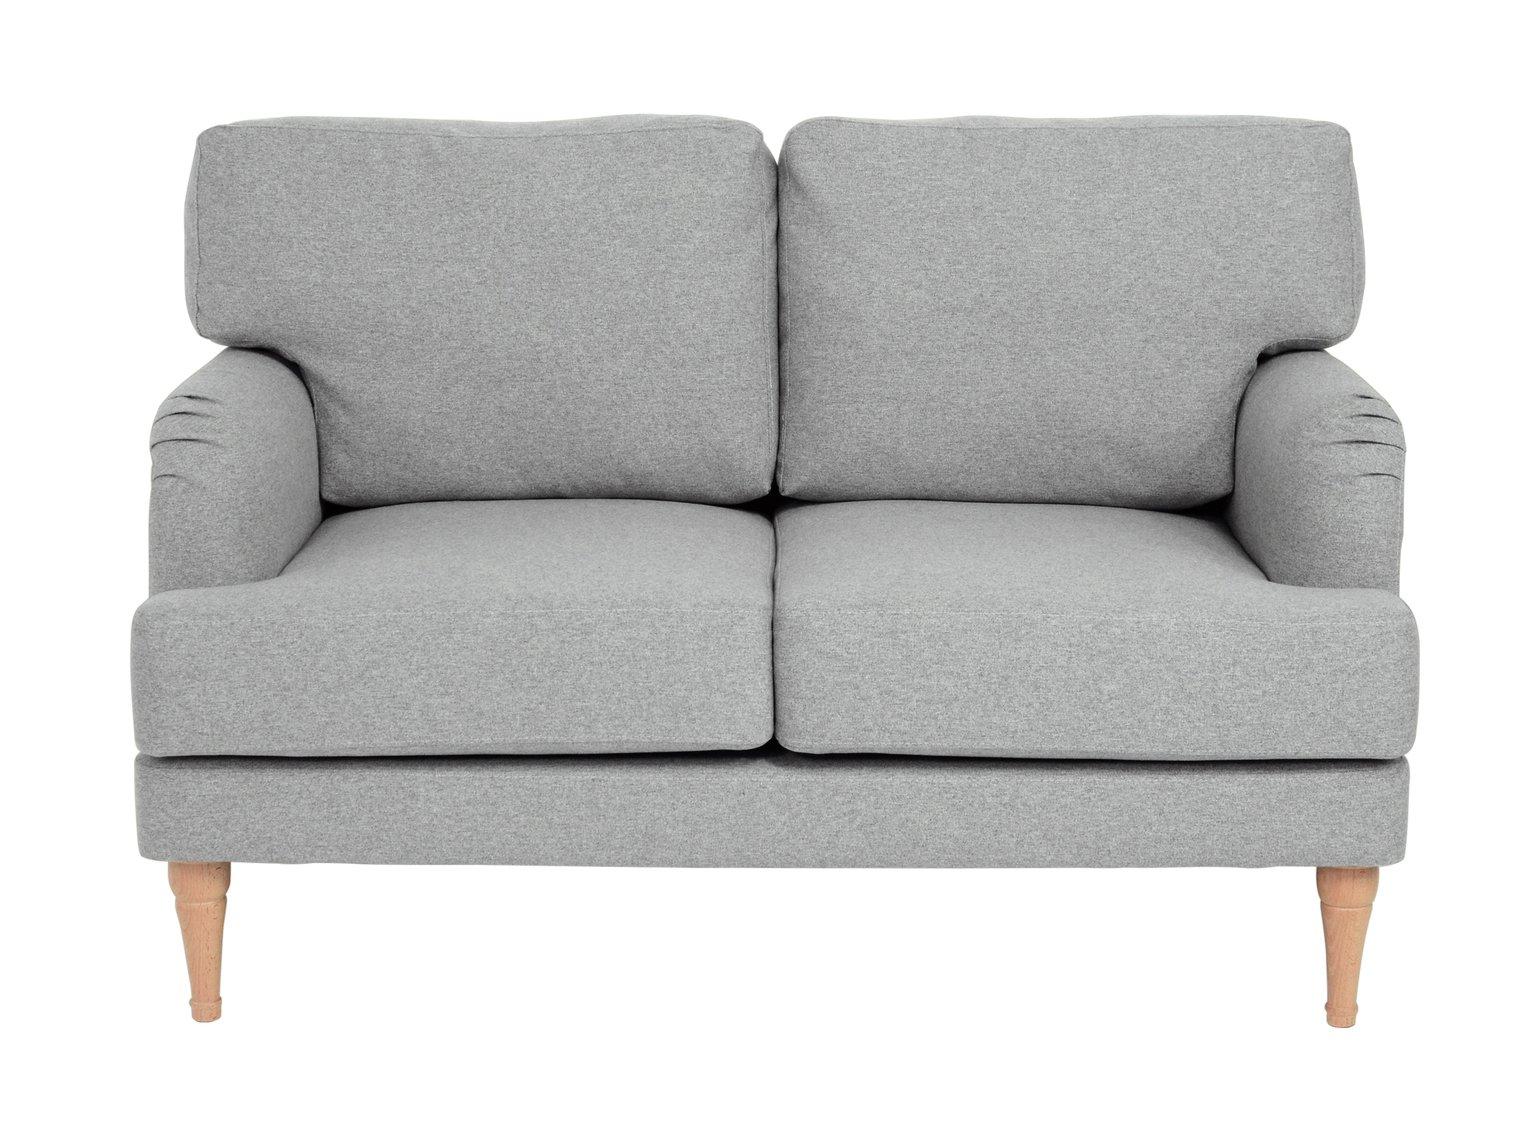 Argos Home Dune 2 Seater Fabric Sofa - Light Grey